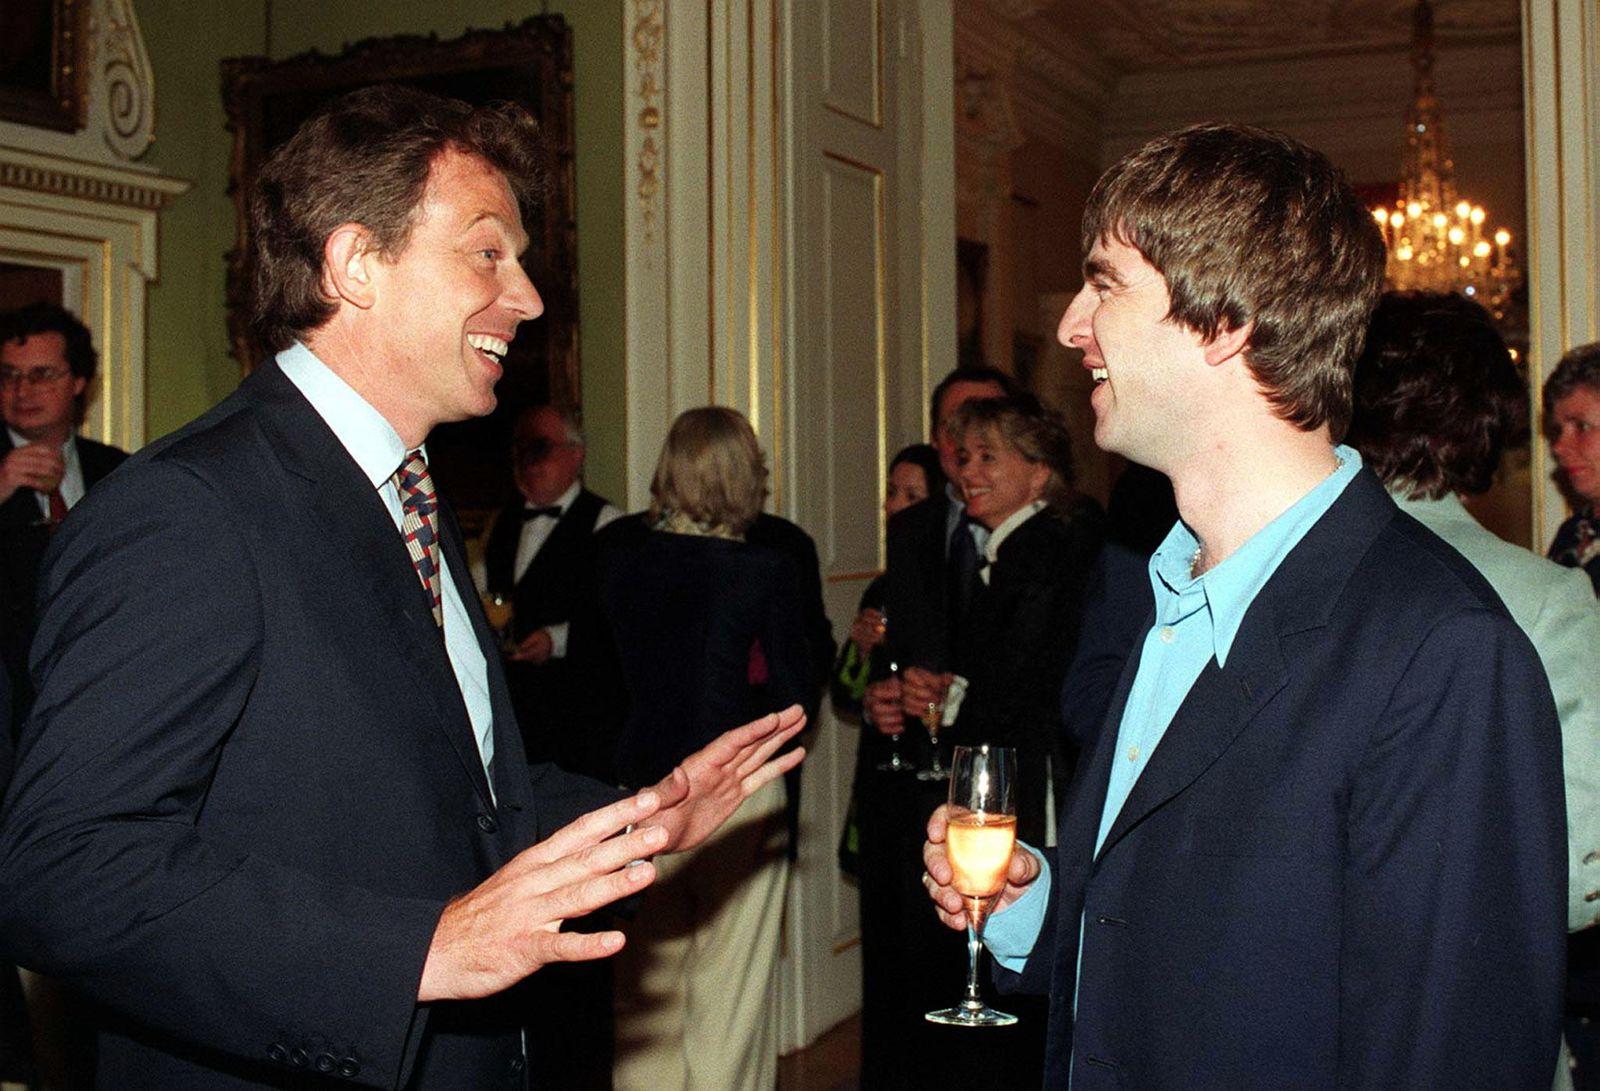 Blair / Noel Gallagher